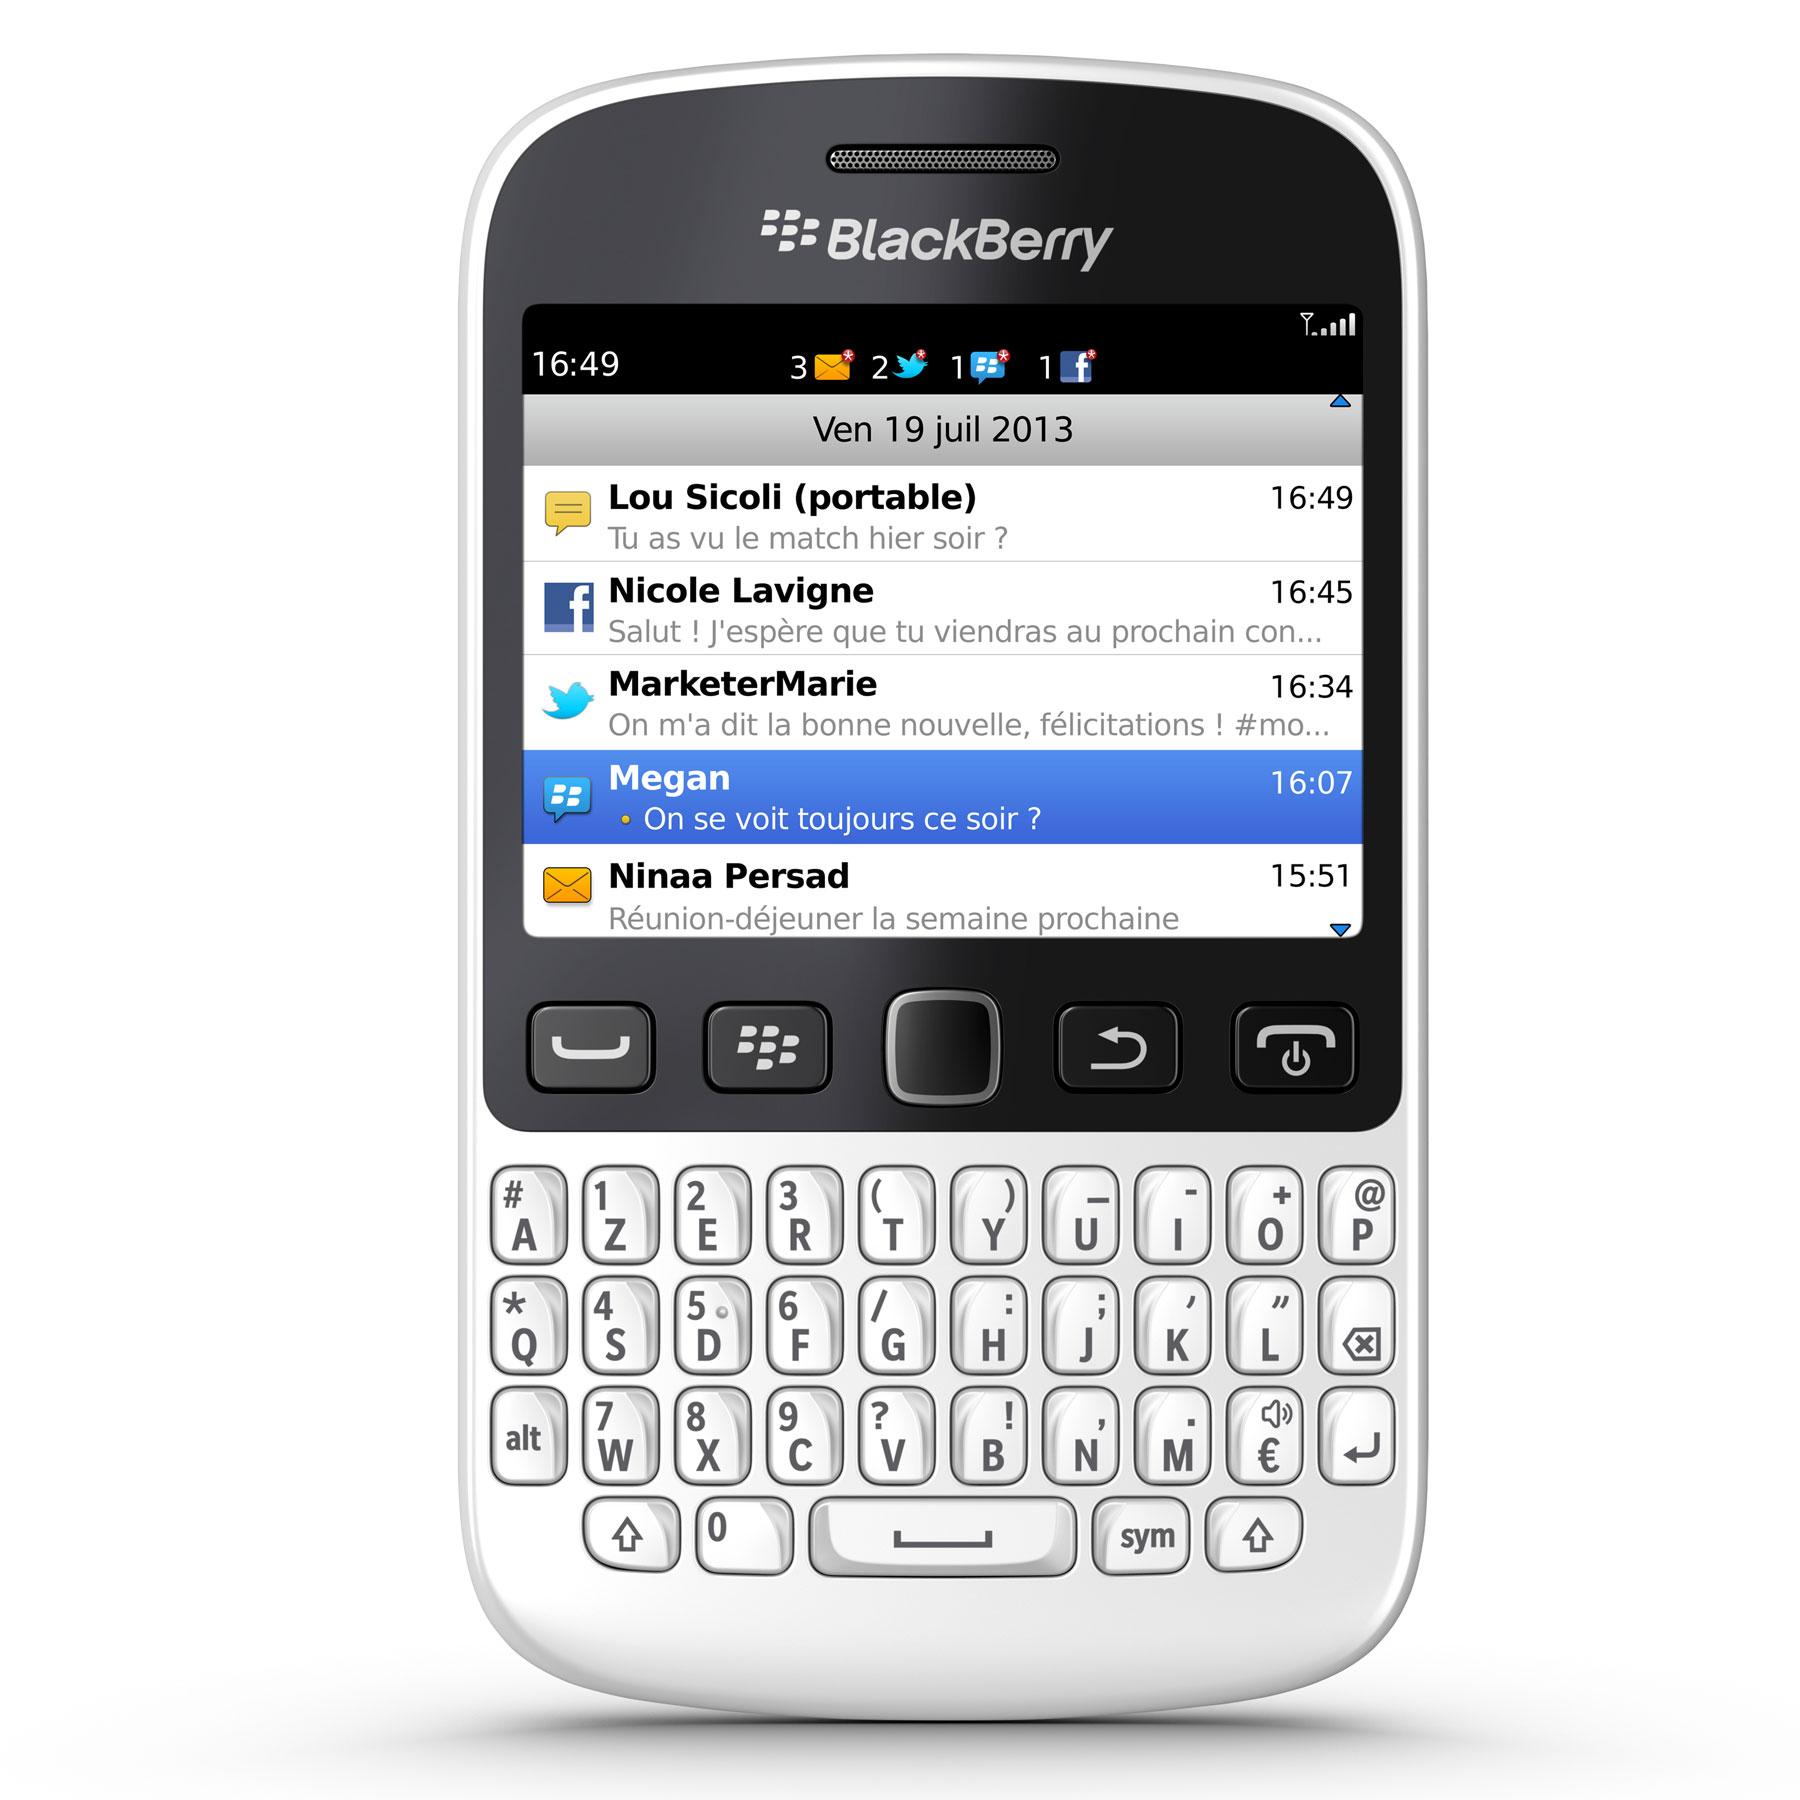 blackberry 9720 azerty blanc mobile smartphone. Black Bedroom Furniture Sets. Home Design Ideas